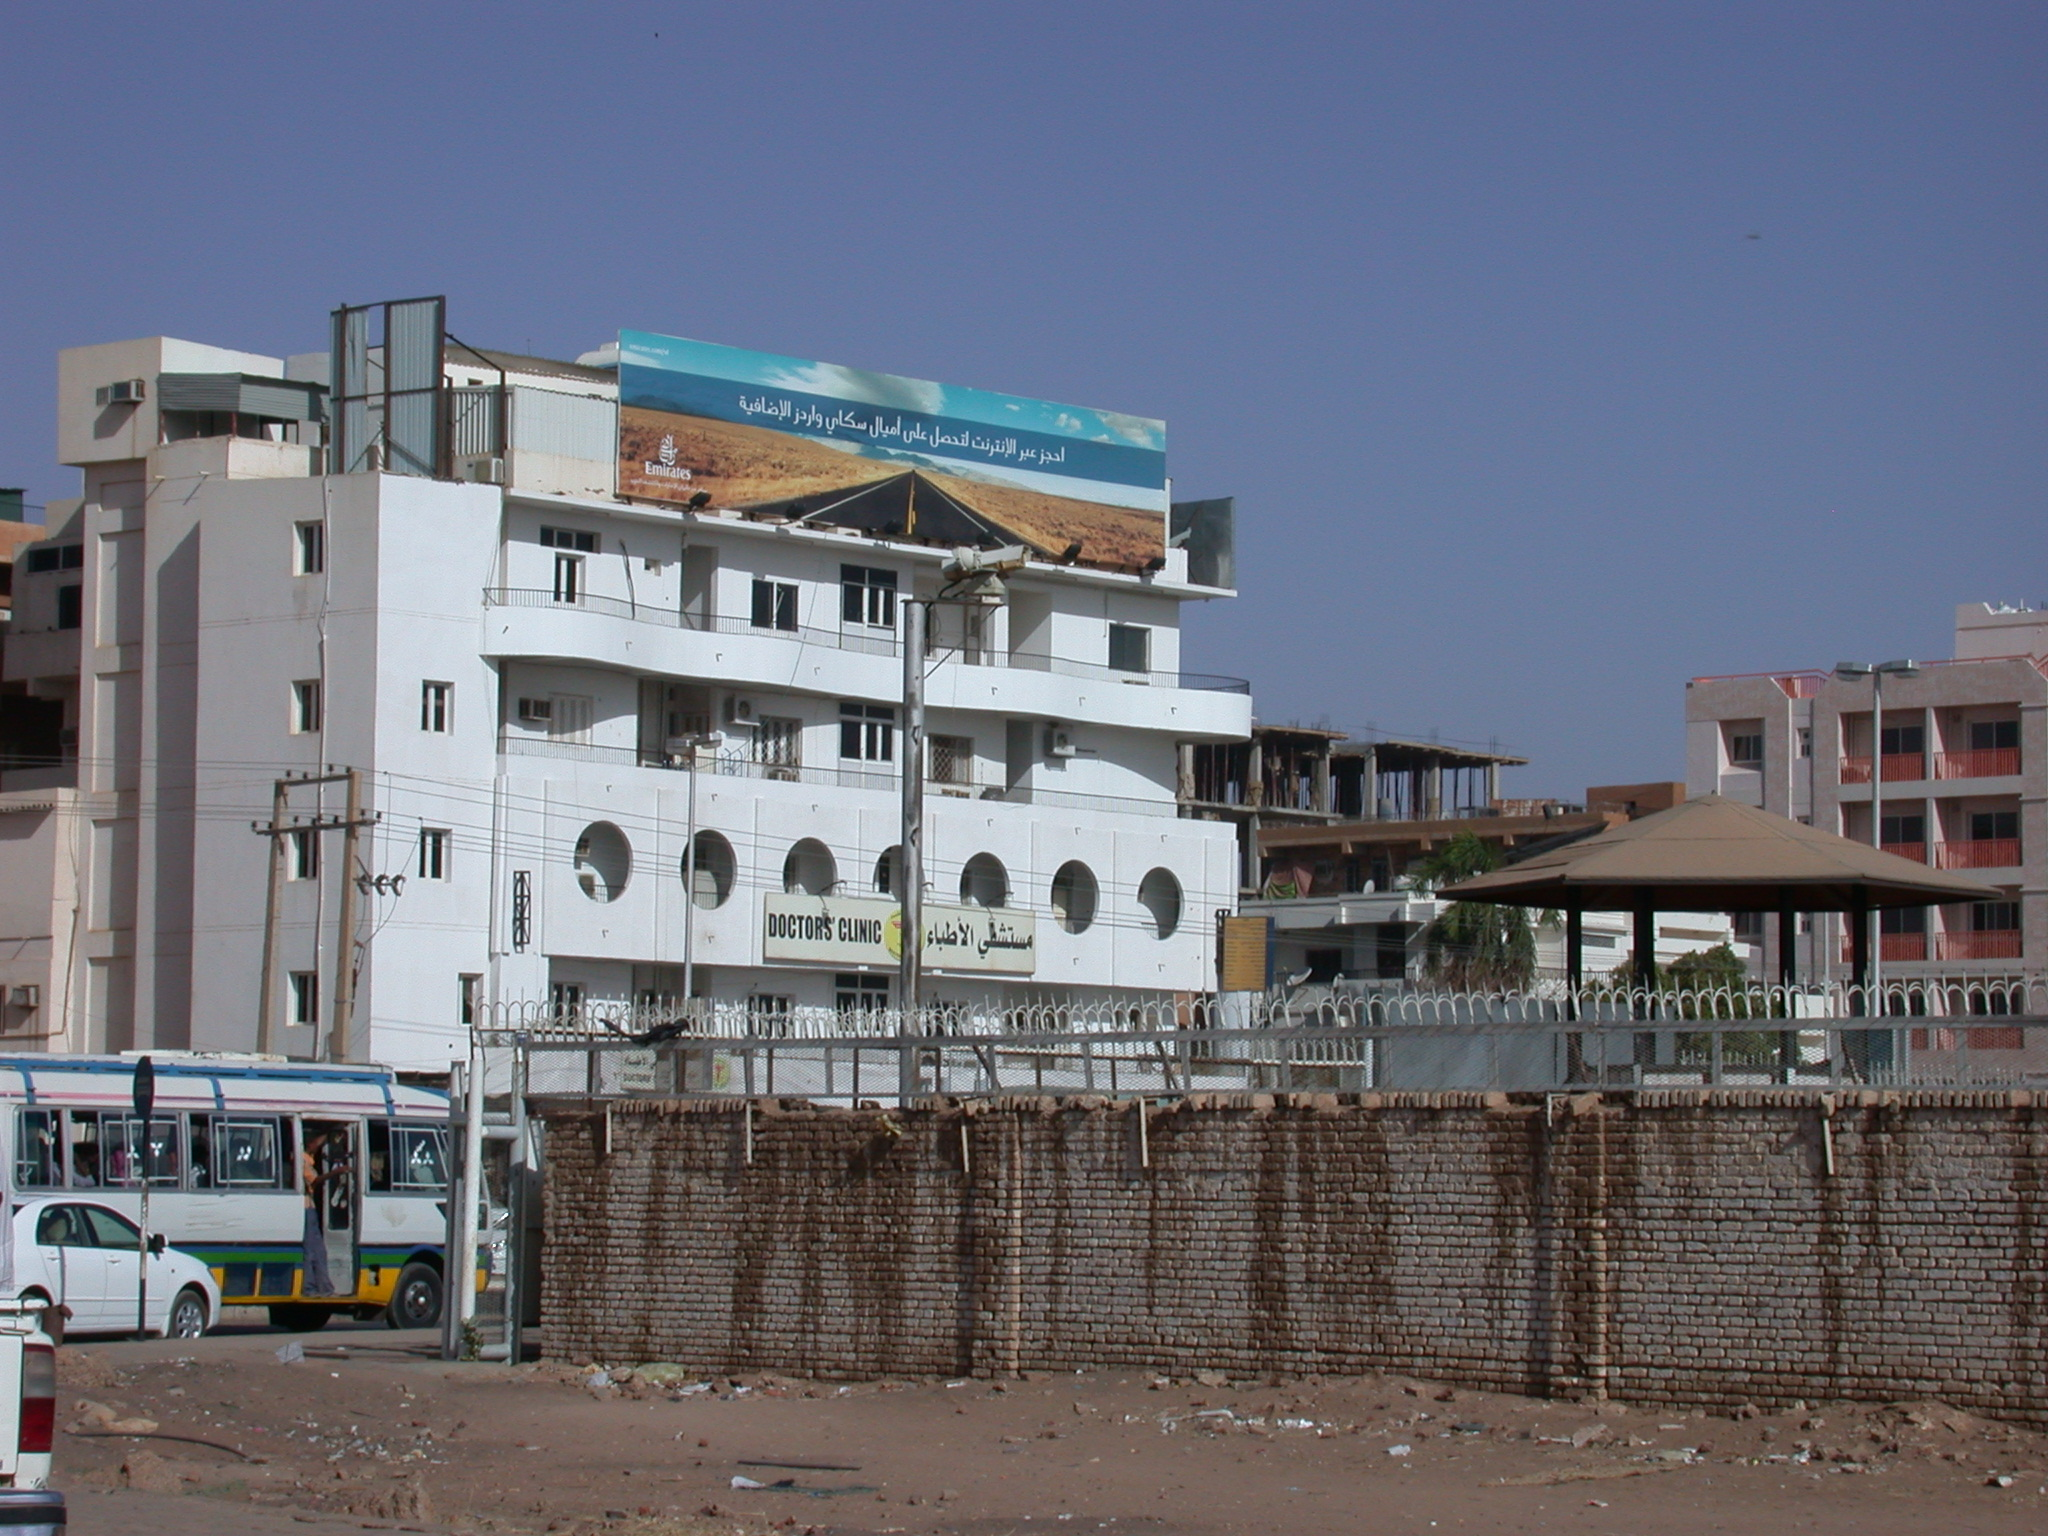 Doctors Clinic, Khartoum, Sudan